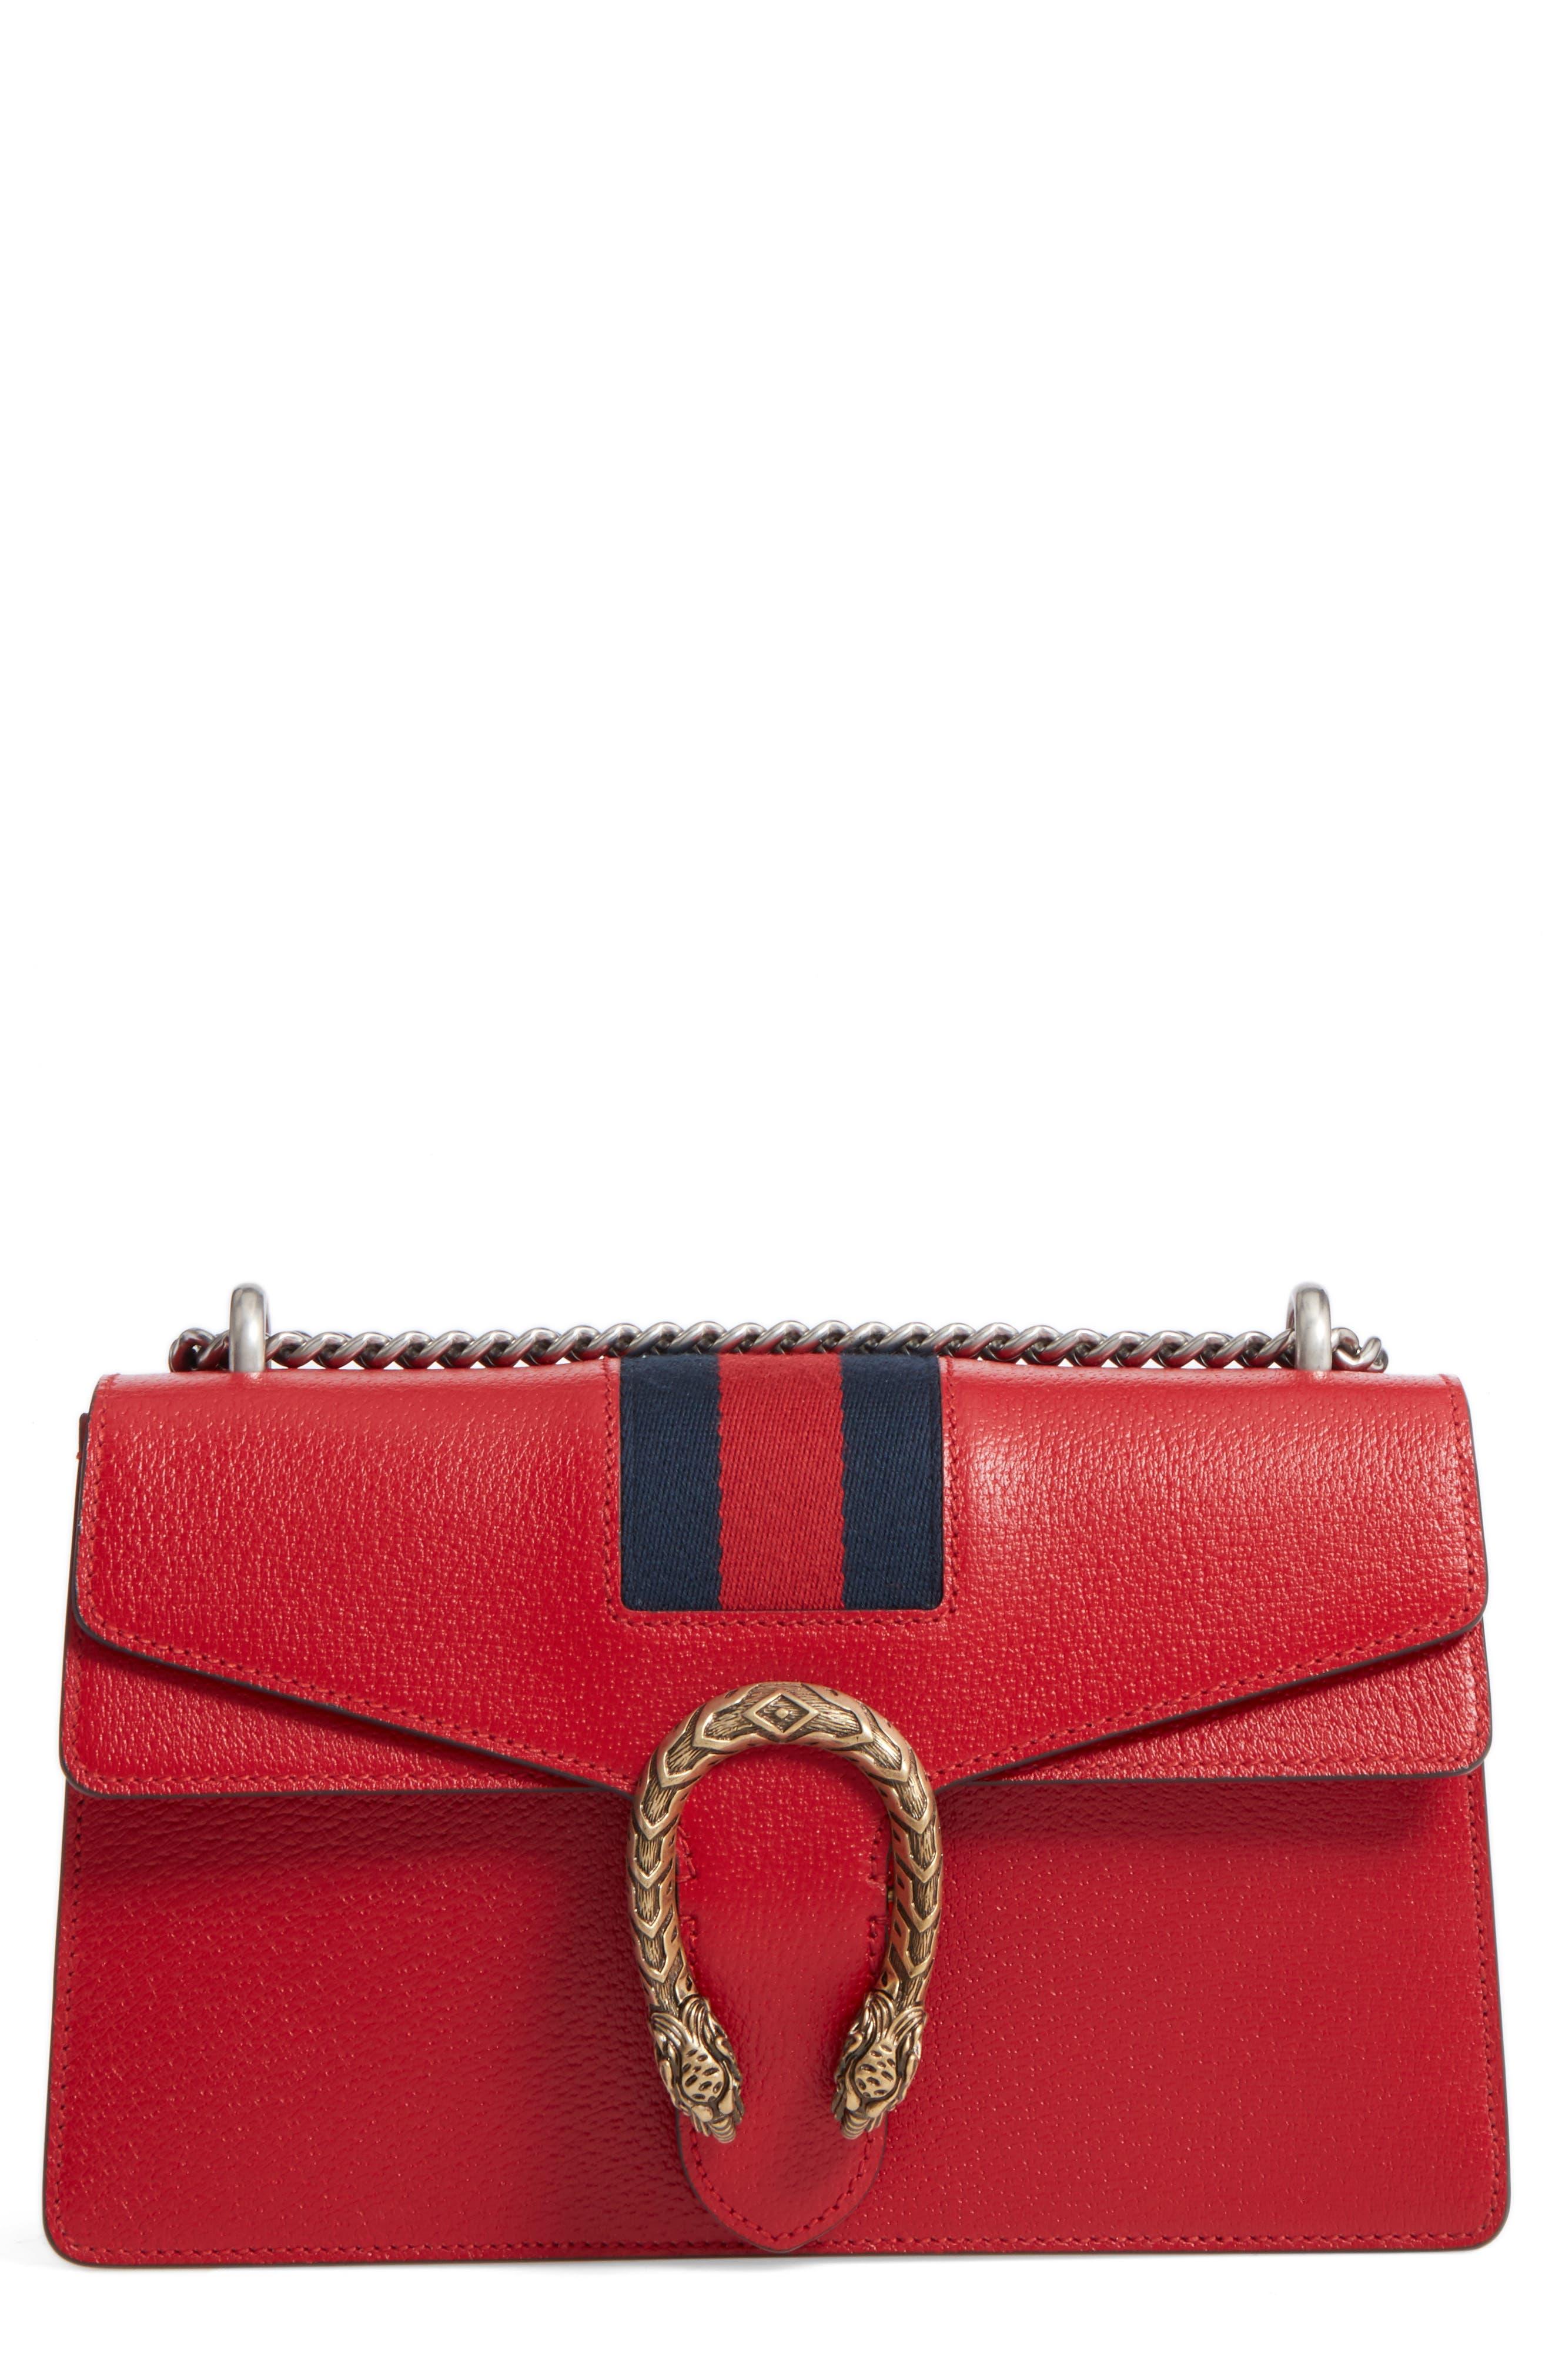 Dionysus Leather Shoulder Bag,                             Main thumbnail 1, color,                             625